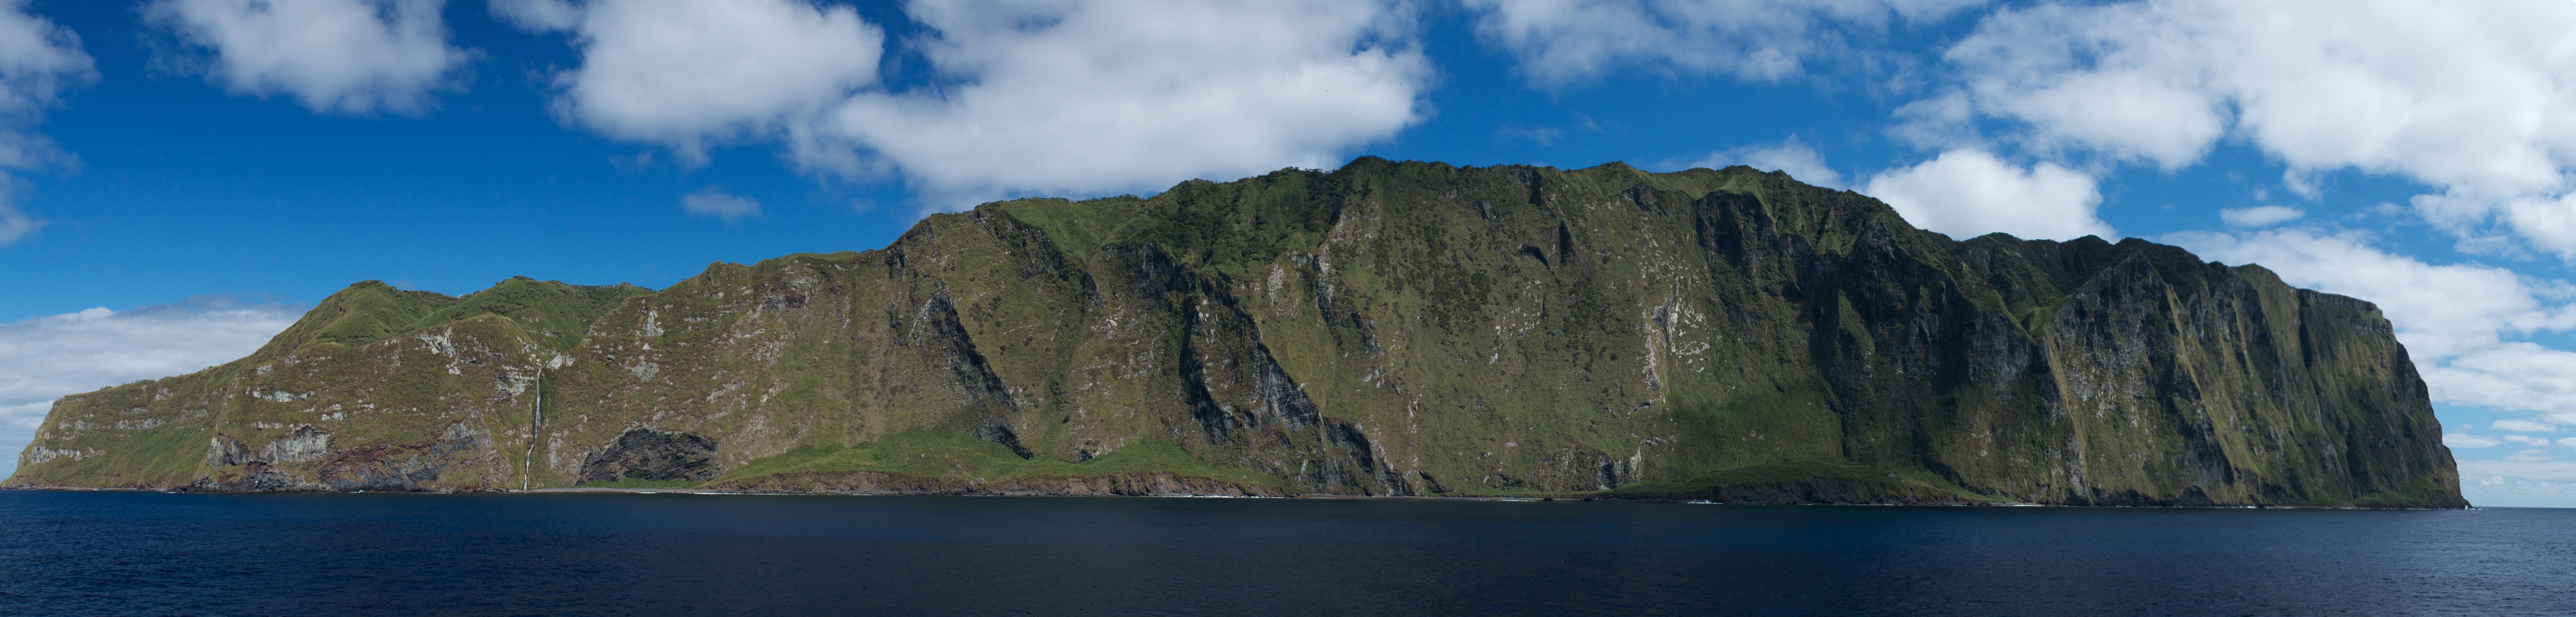 Inaccessible_Island_Panorama_(Large).jpg